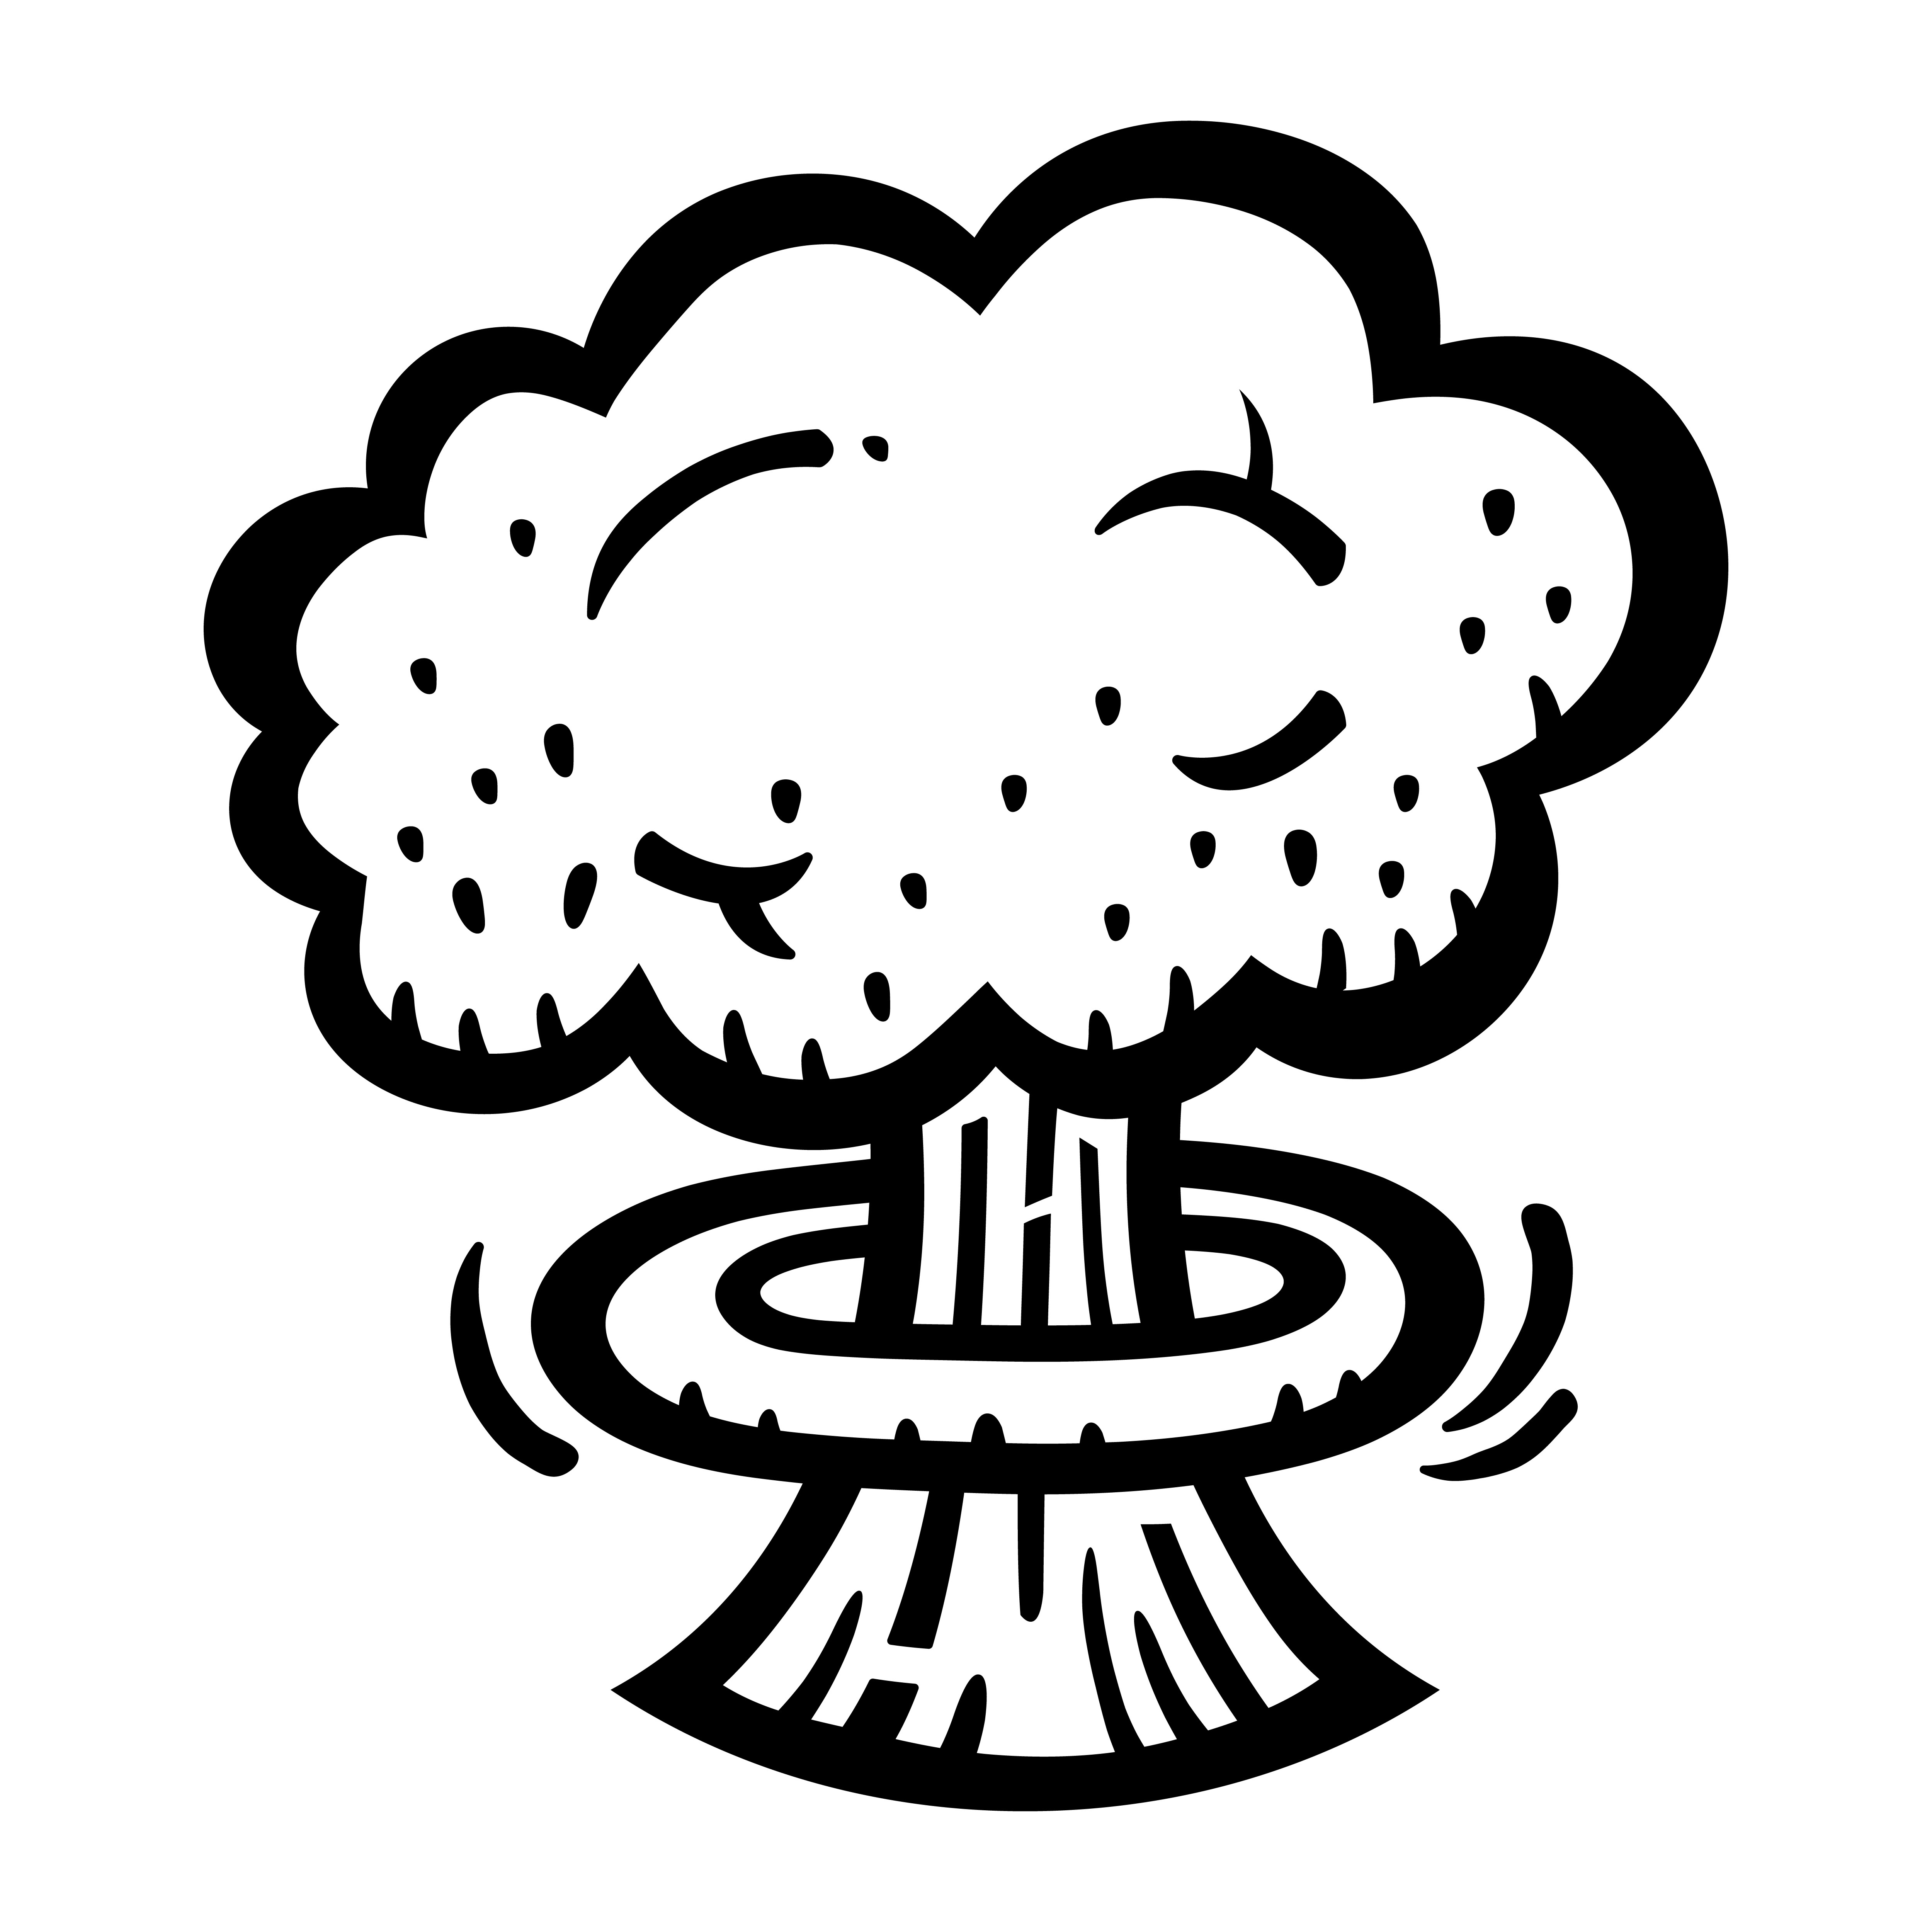 Mushroom Cloud Atomic Nuclear Explosion Fallout